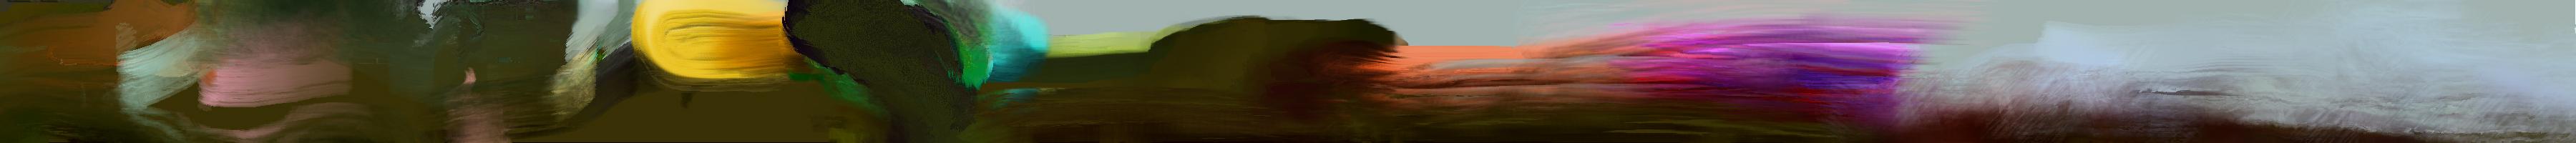 brushland2.jpg